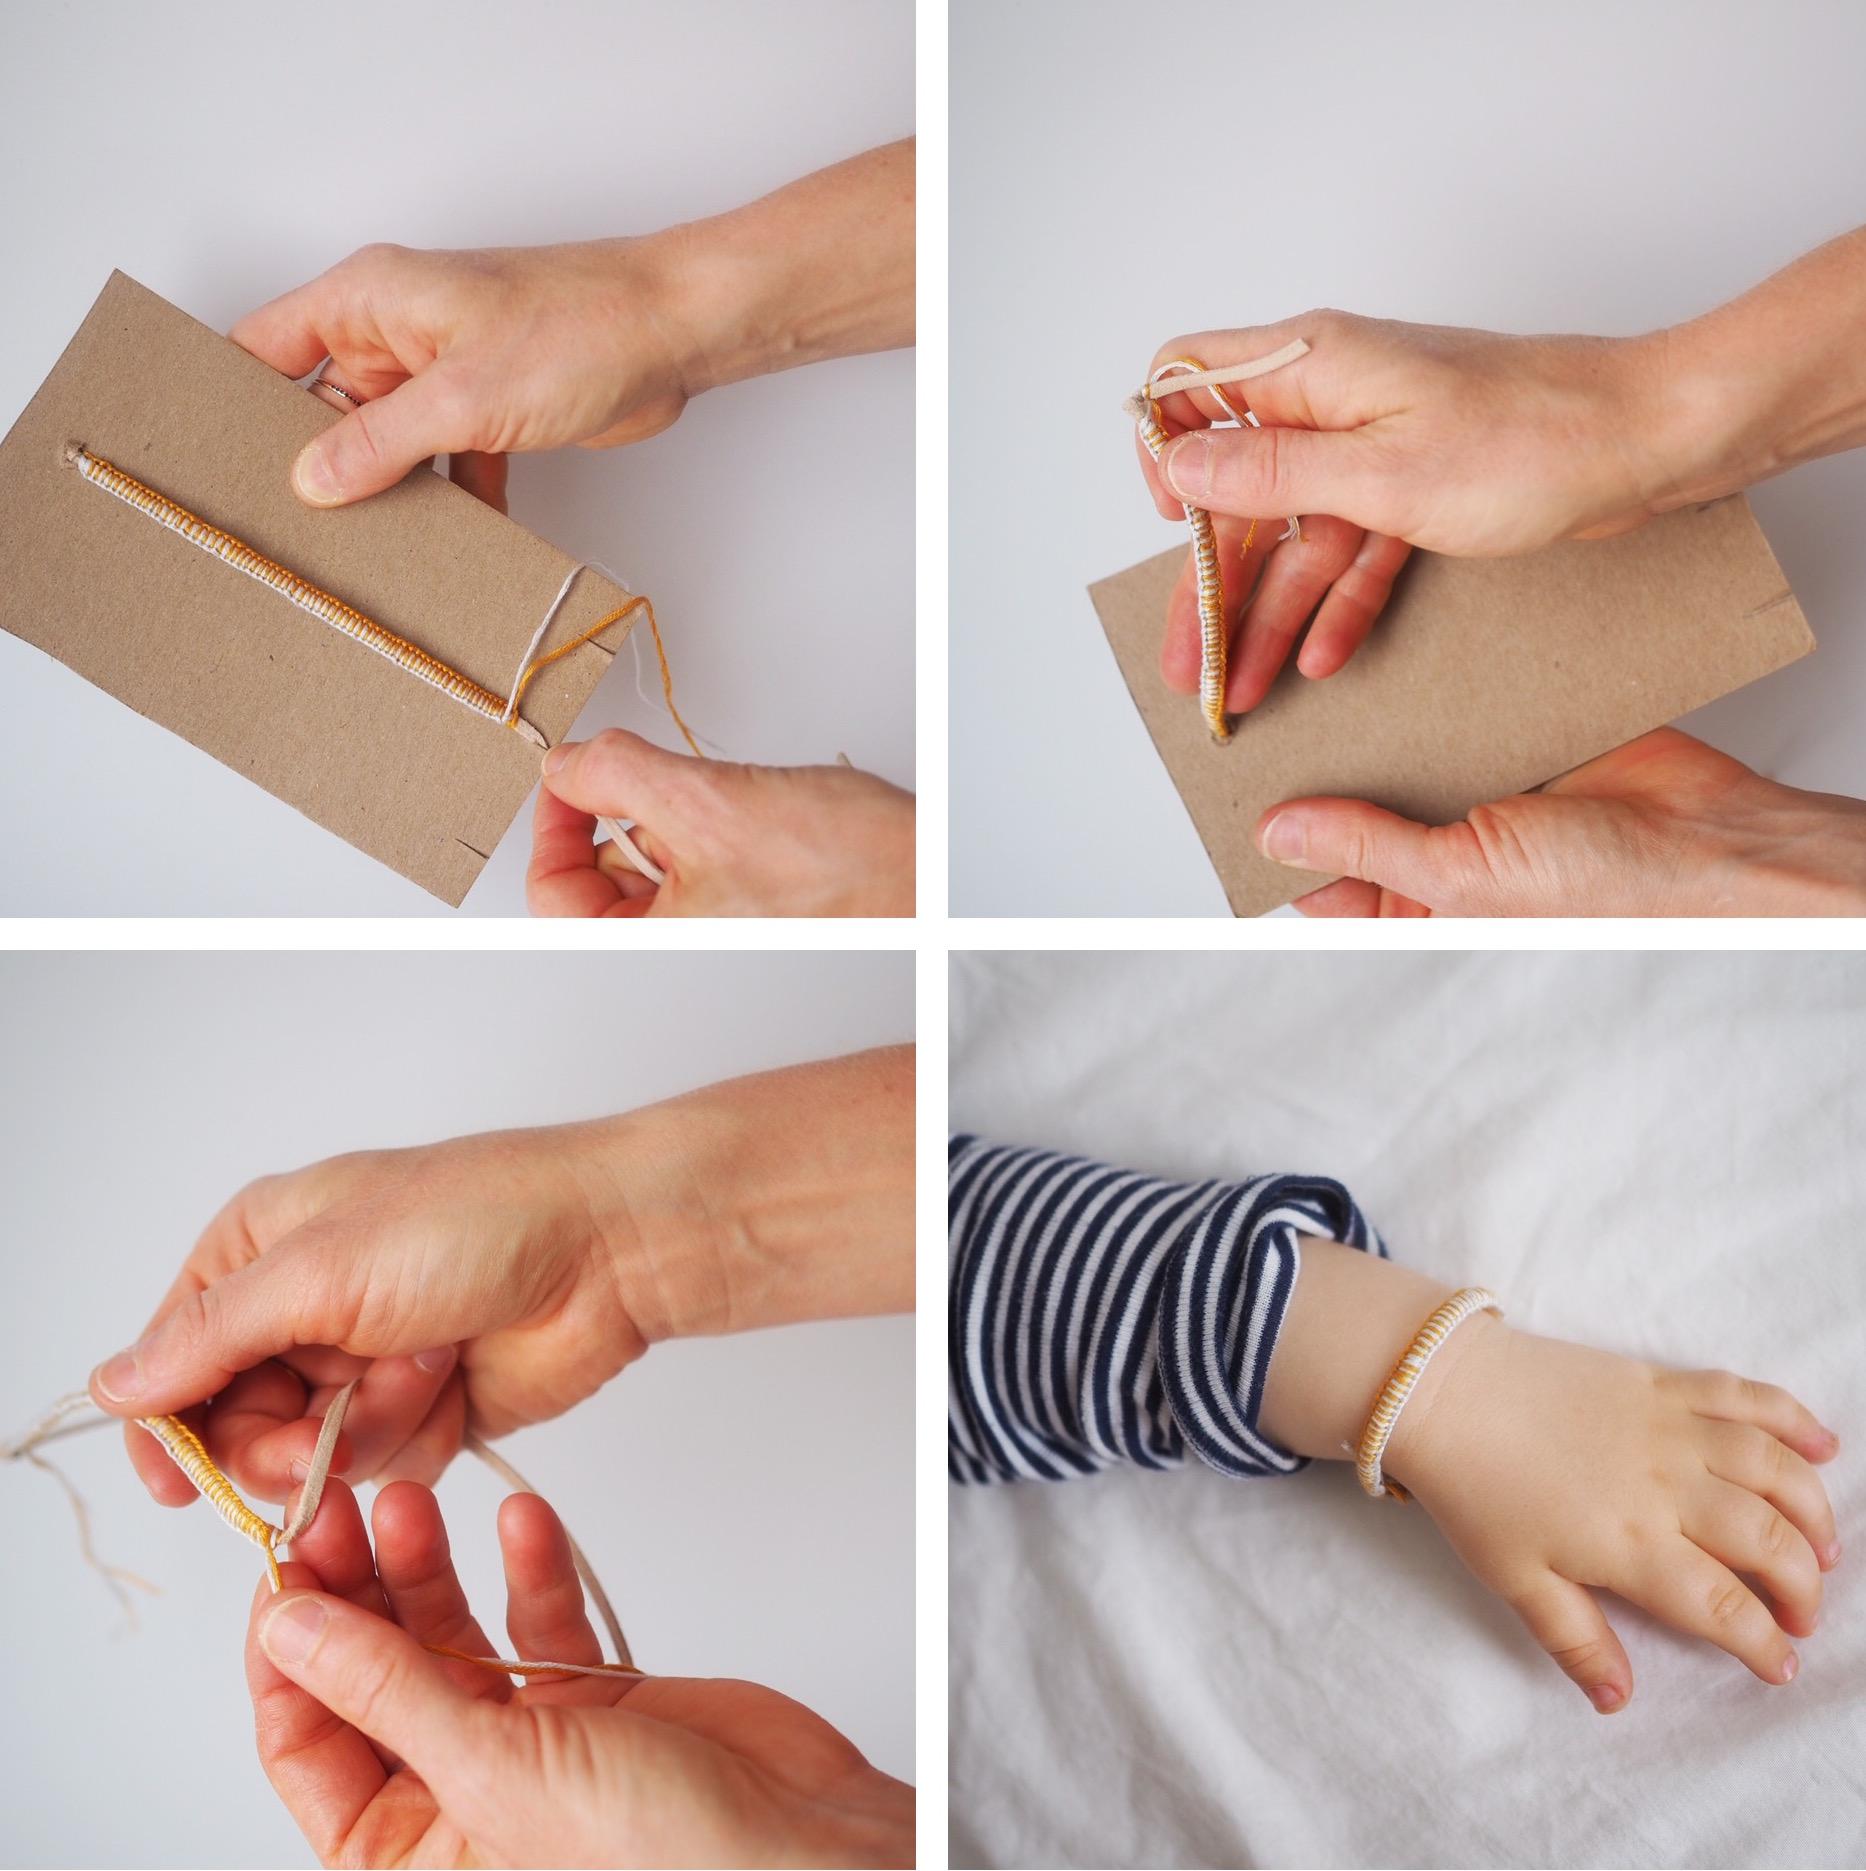 rose pearlman friendship bracelet | reading my tea leaves